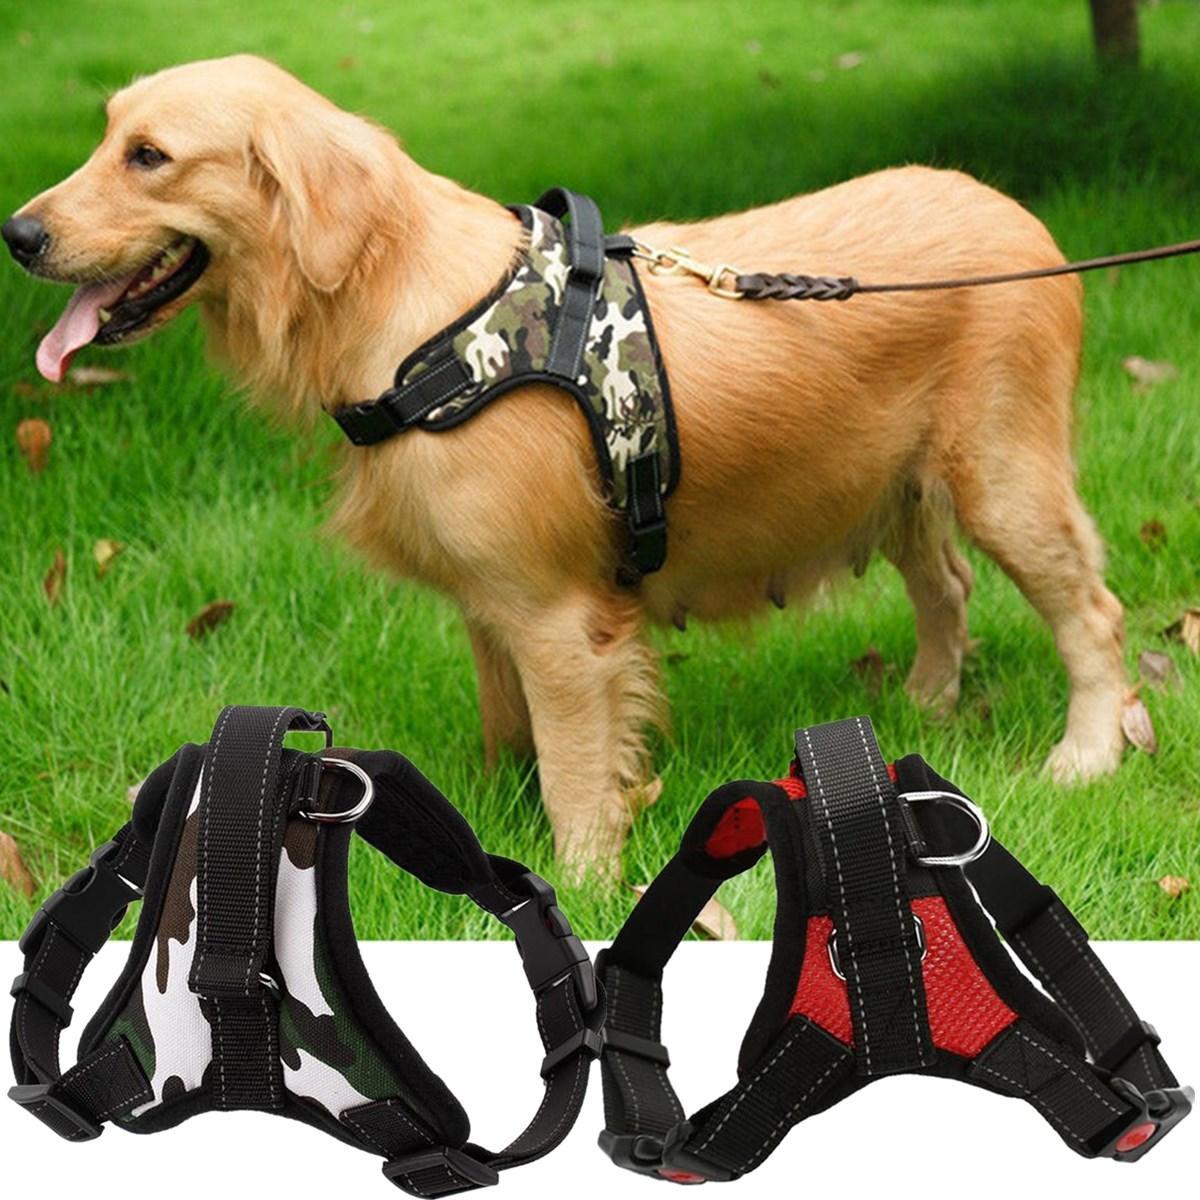 L Xl Dogs Harness Collars Tactical Vest